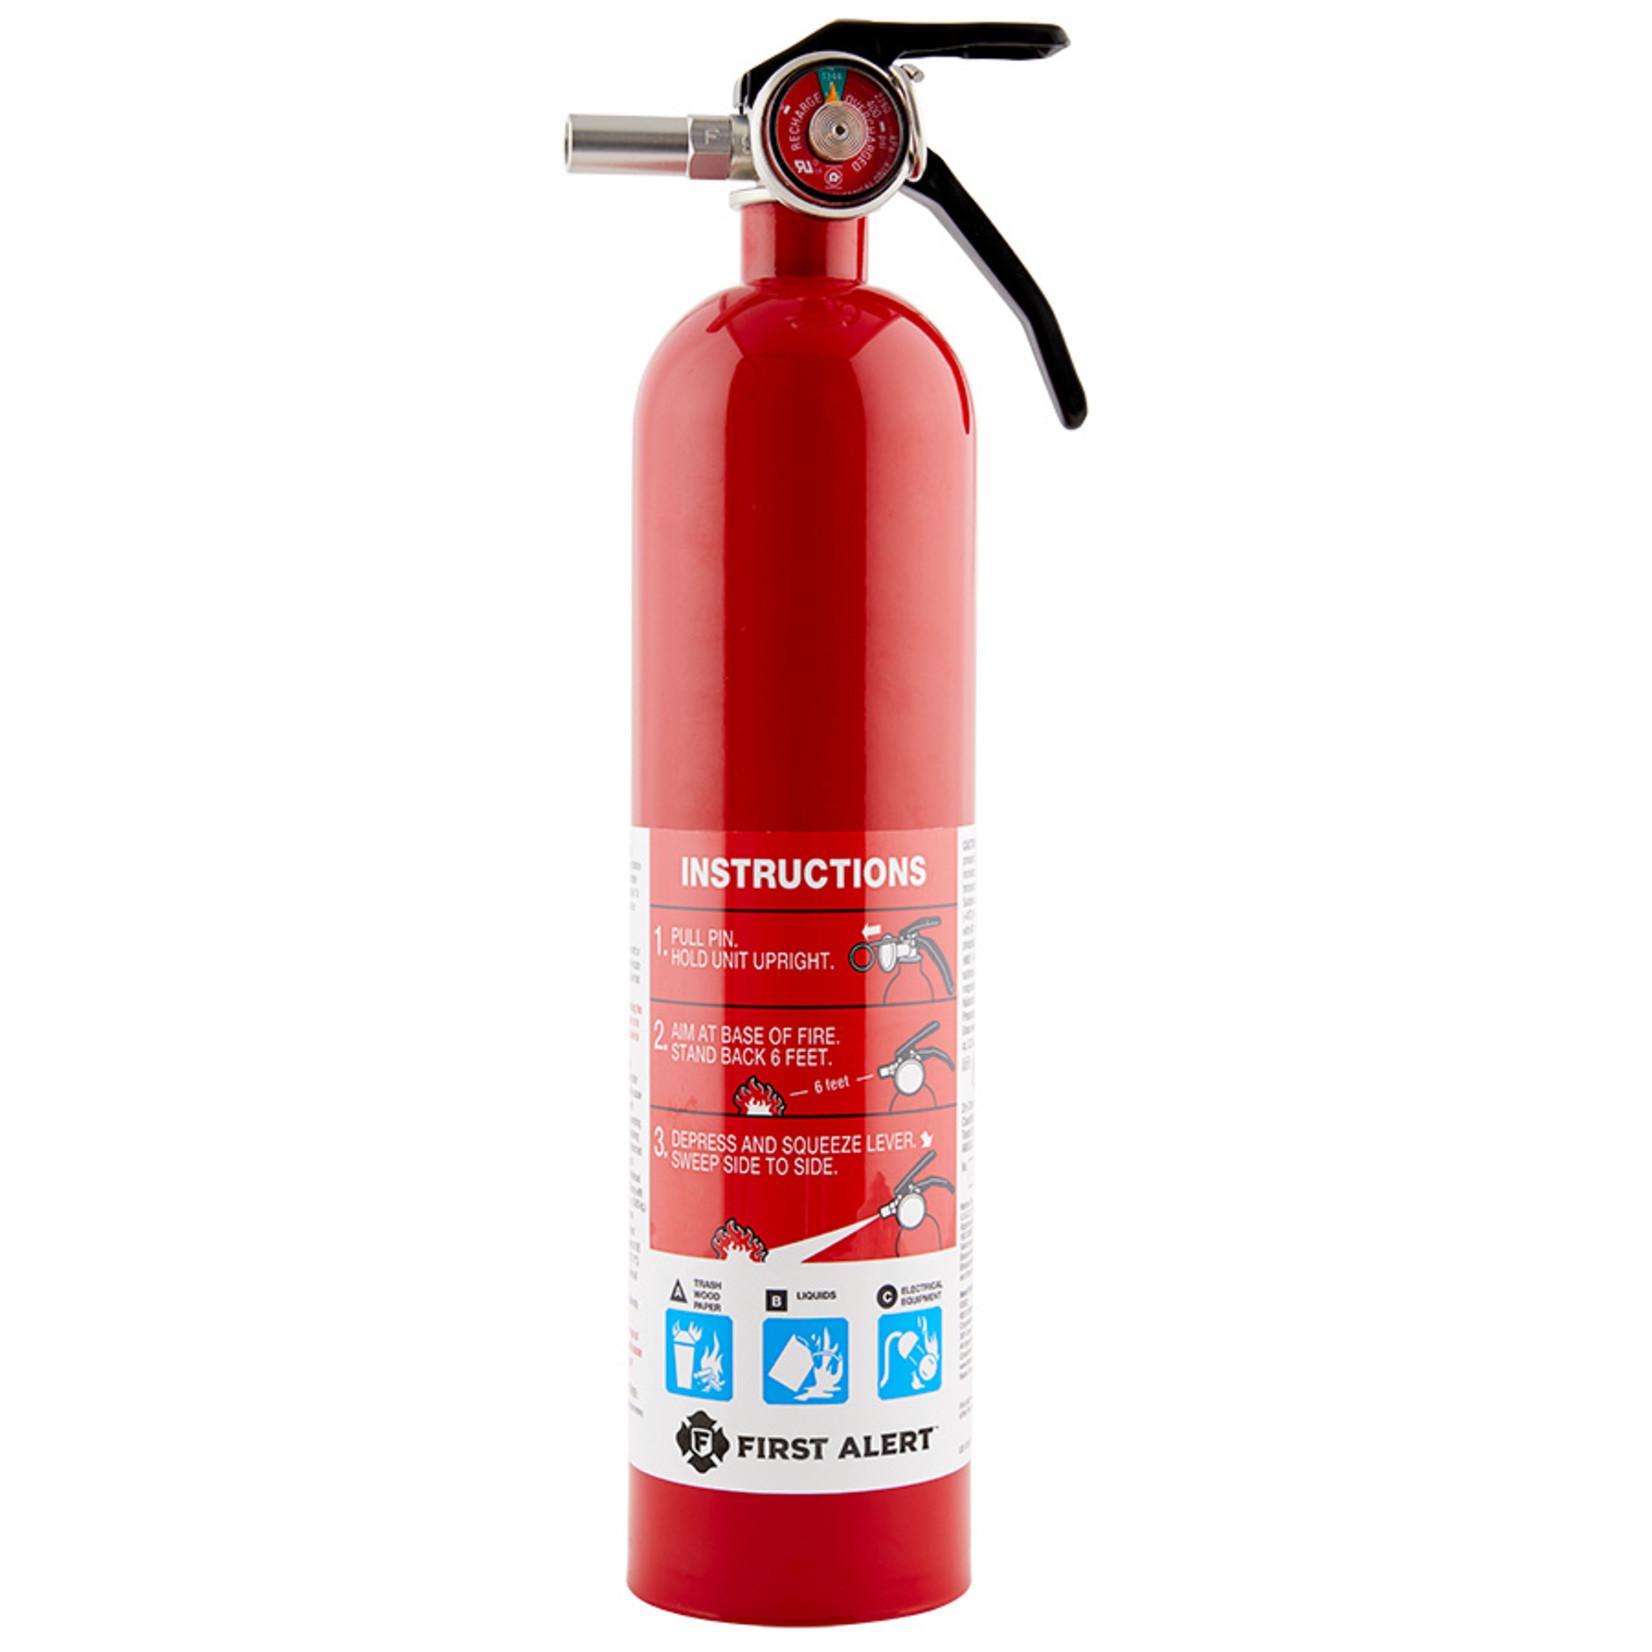 BRK PRO 2.5lb Fire Extinguisher